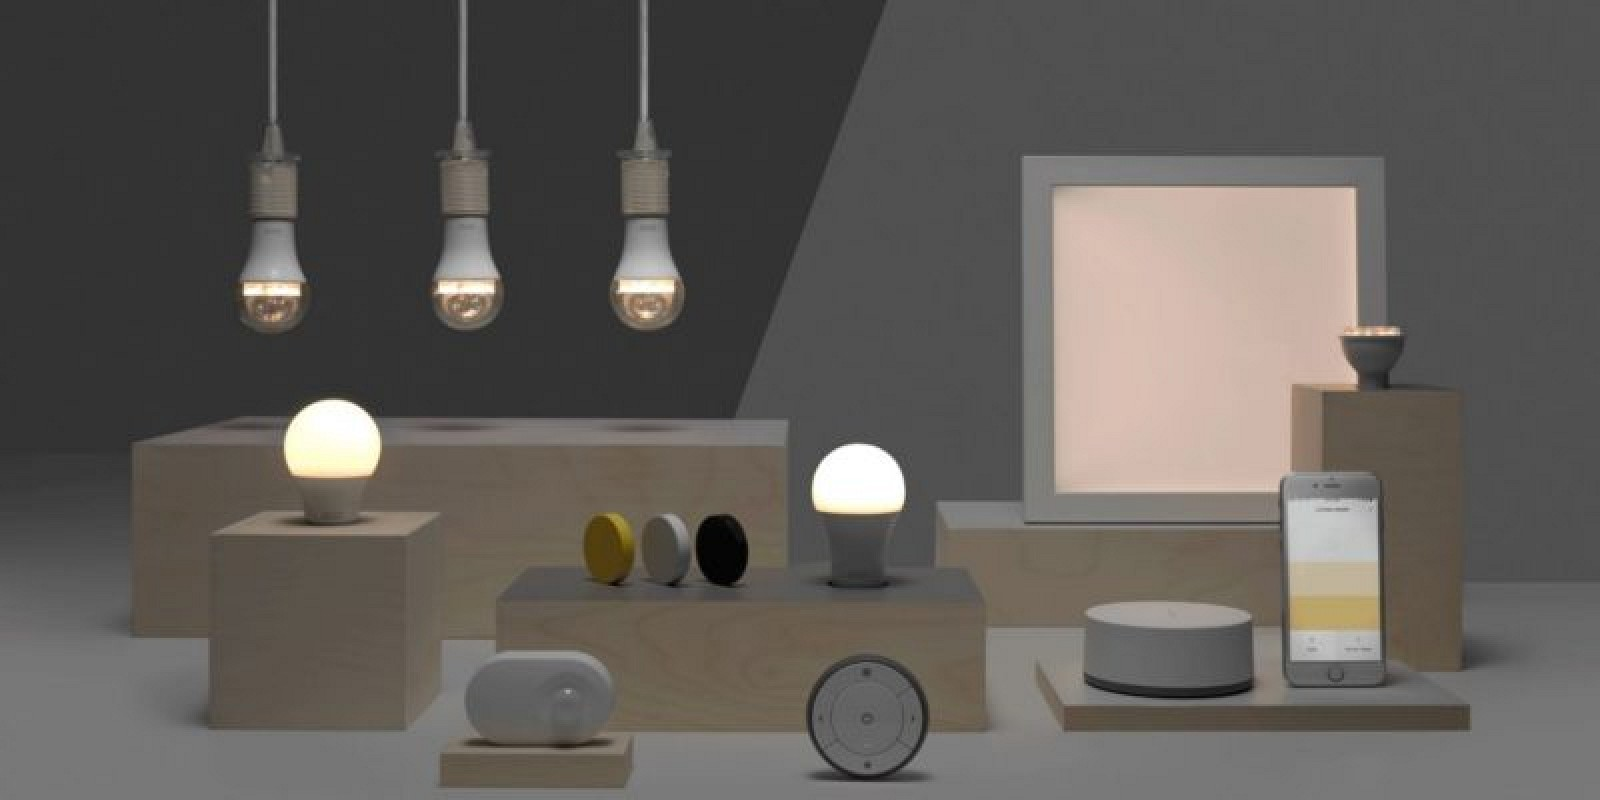 IKEA Trådfri Smart Lighting System to Get Apple HomeKit Support